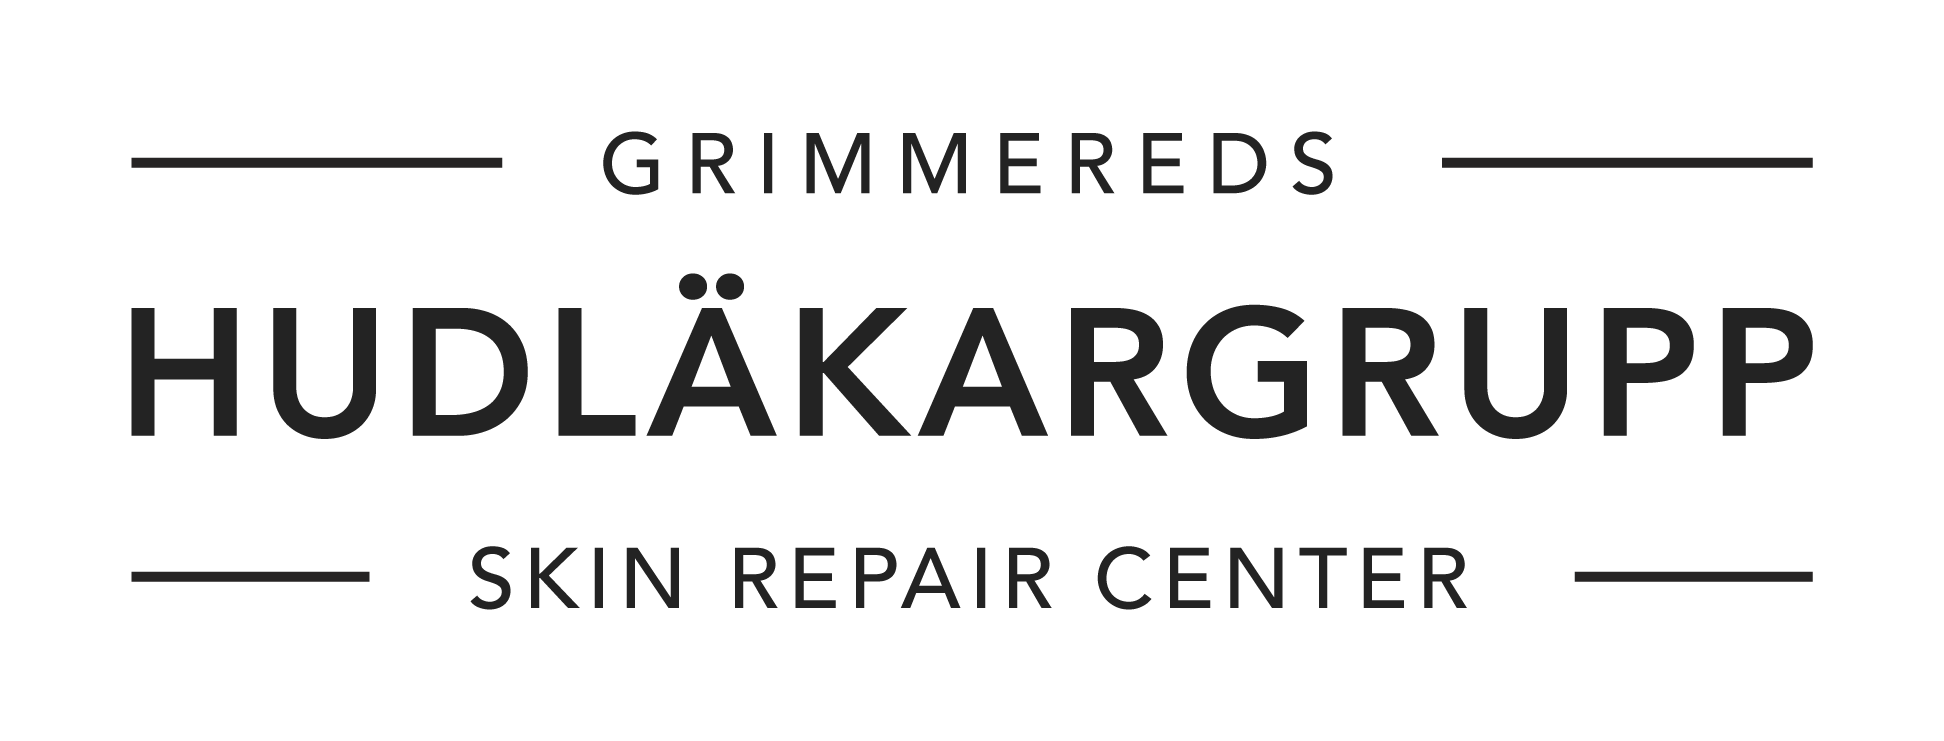 Grimmereds Hudläkargrupp